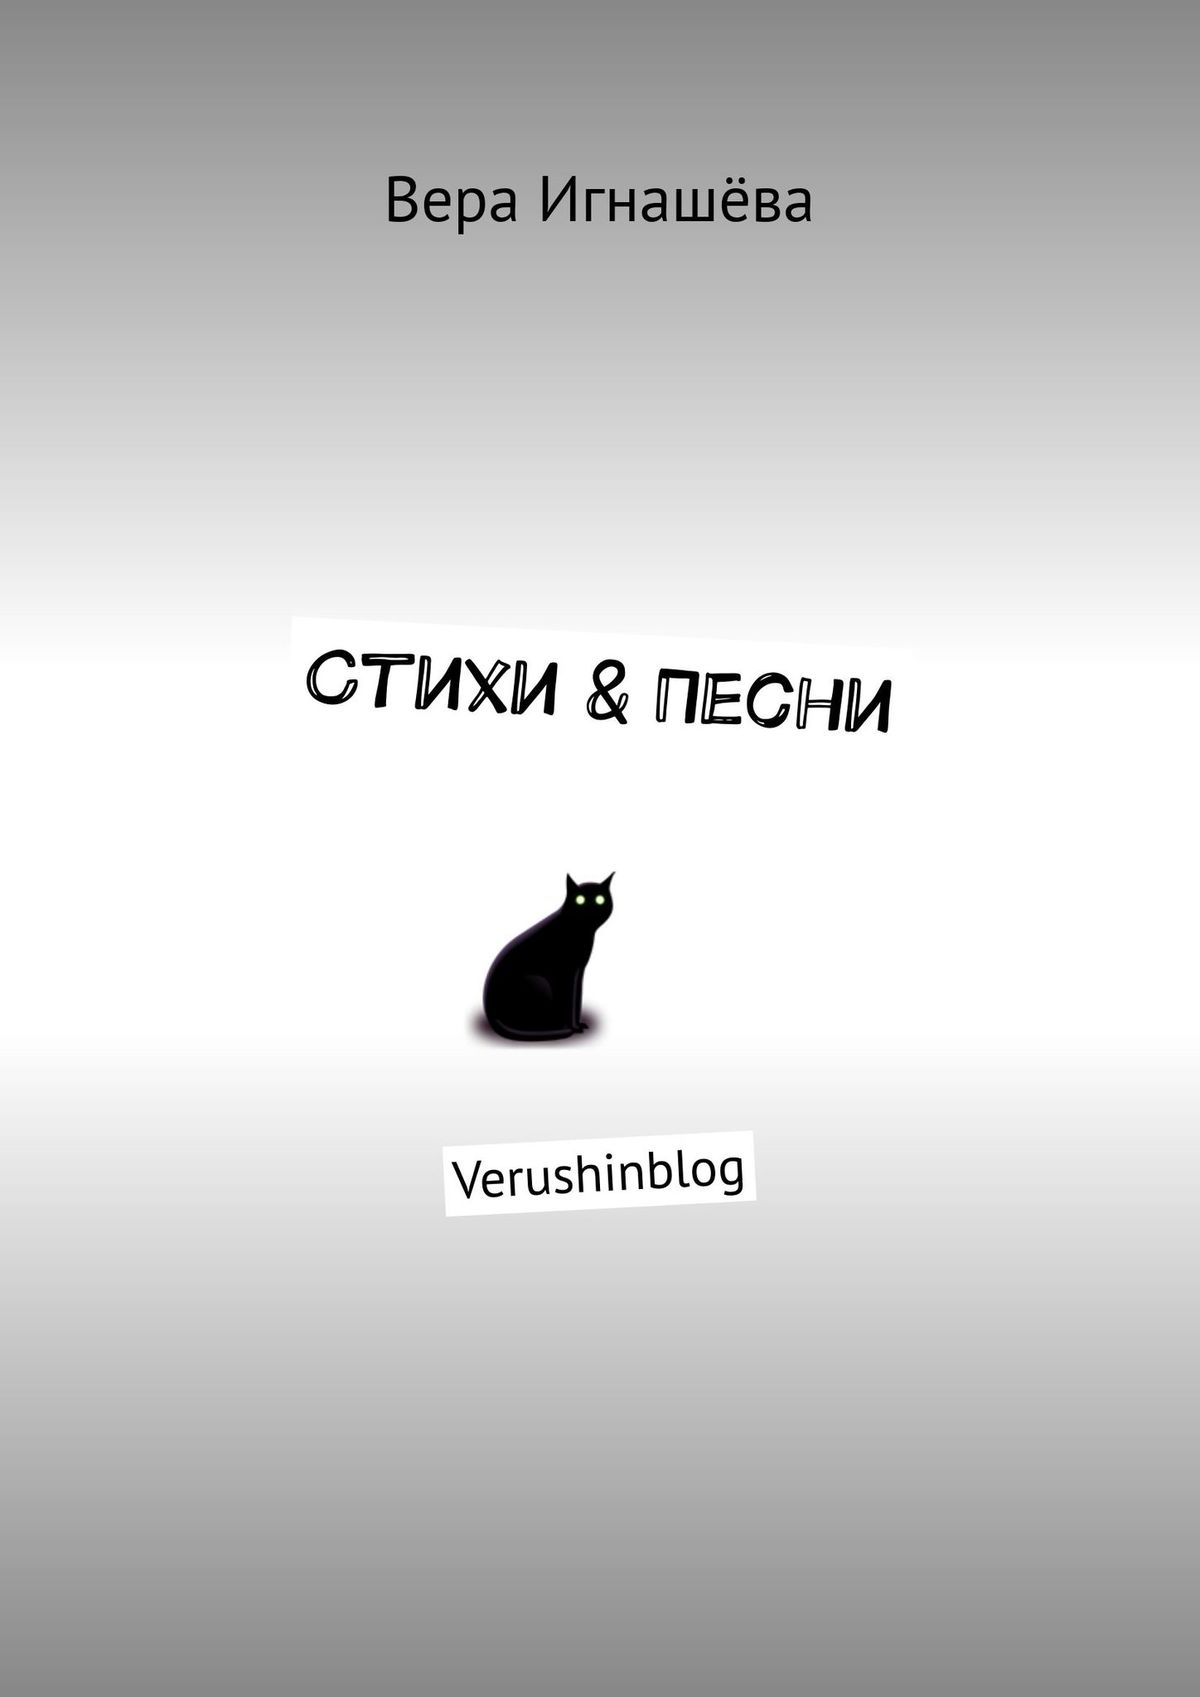 Стихи&Песни. Verushinblog